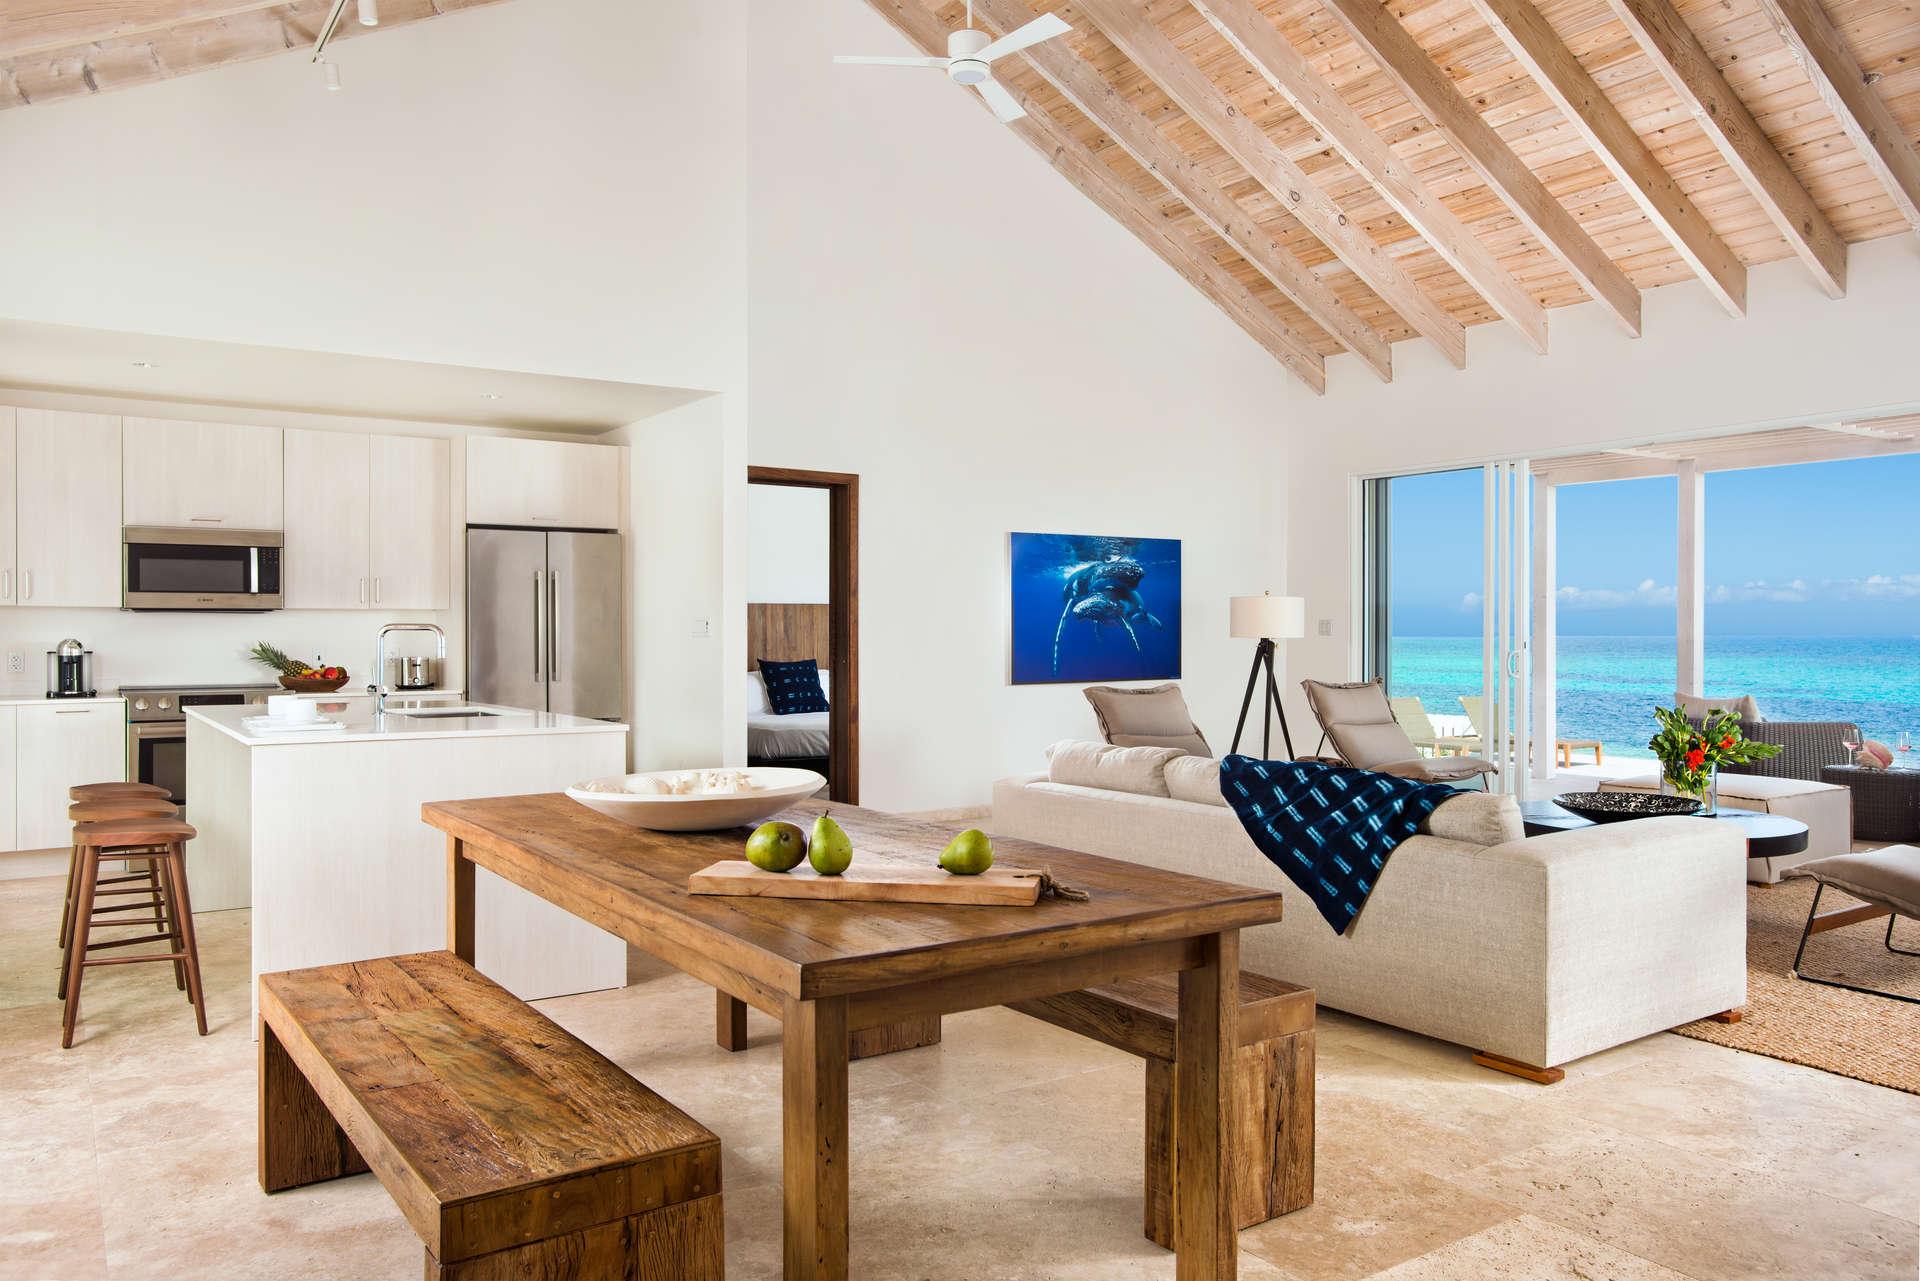 Luxury villa rentals caribbean - Turks and caicos - South caicos - Sailrock resort - Beachfront 4 BDM - Image 1/15